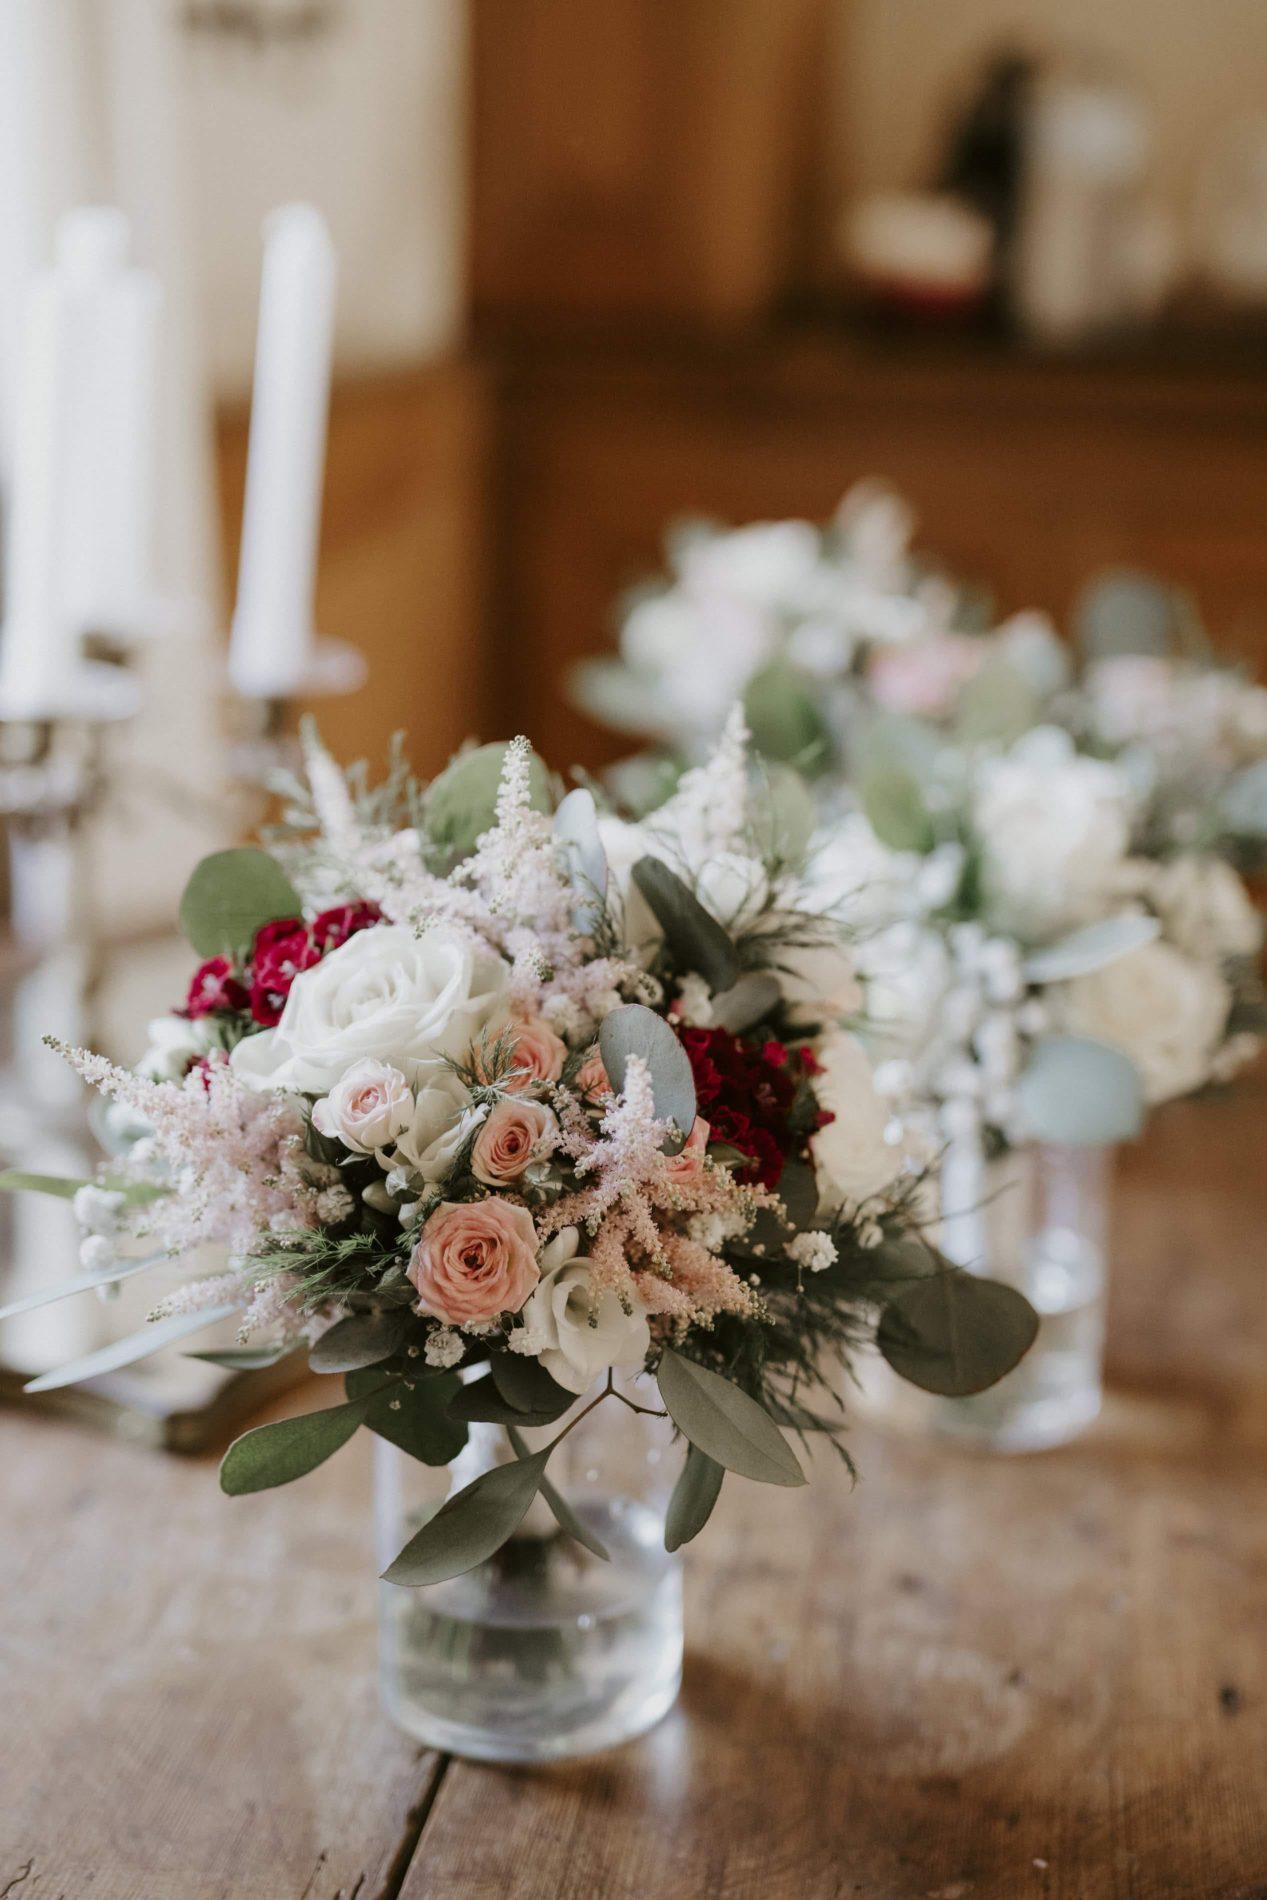 01-CelineSereivuth-136-obonheurdesdames-decoration-mariage-location-Jordane-Chaillou